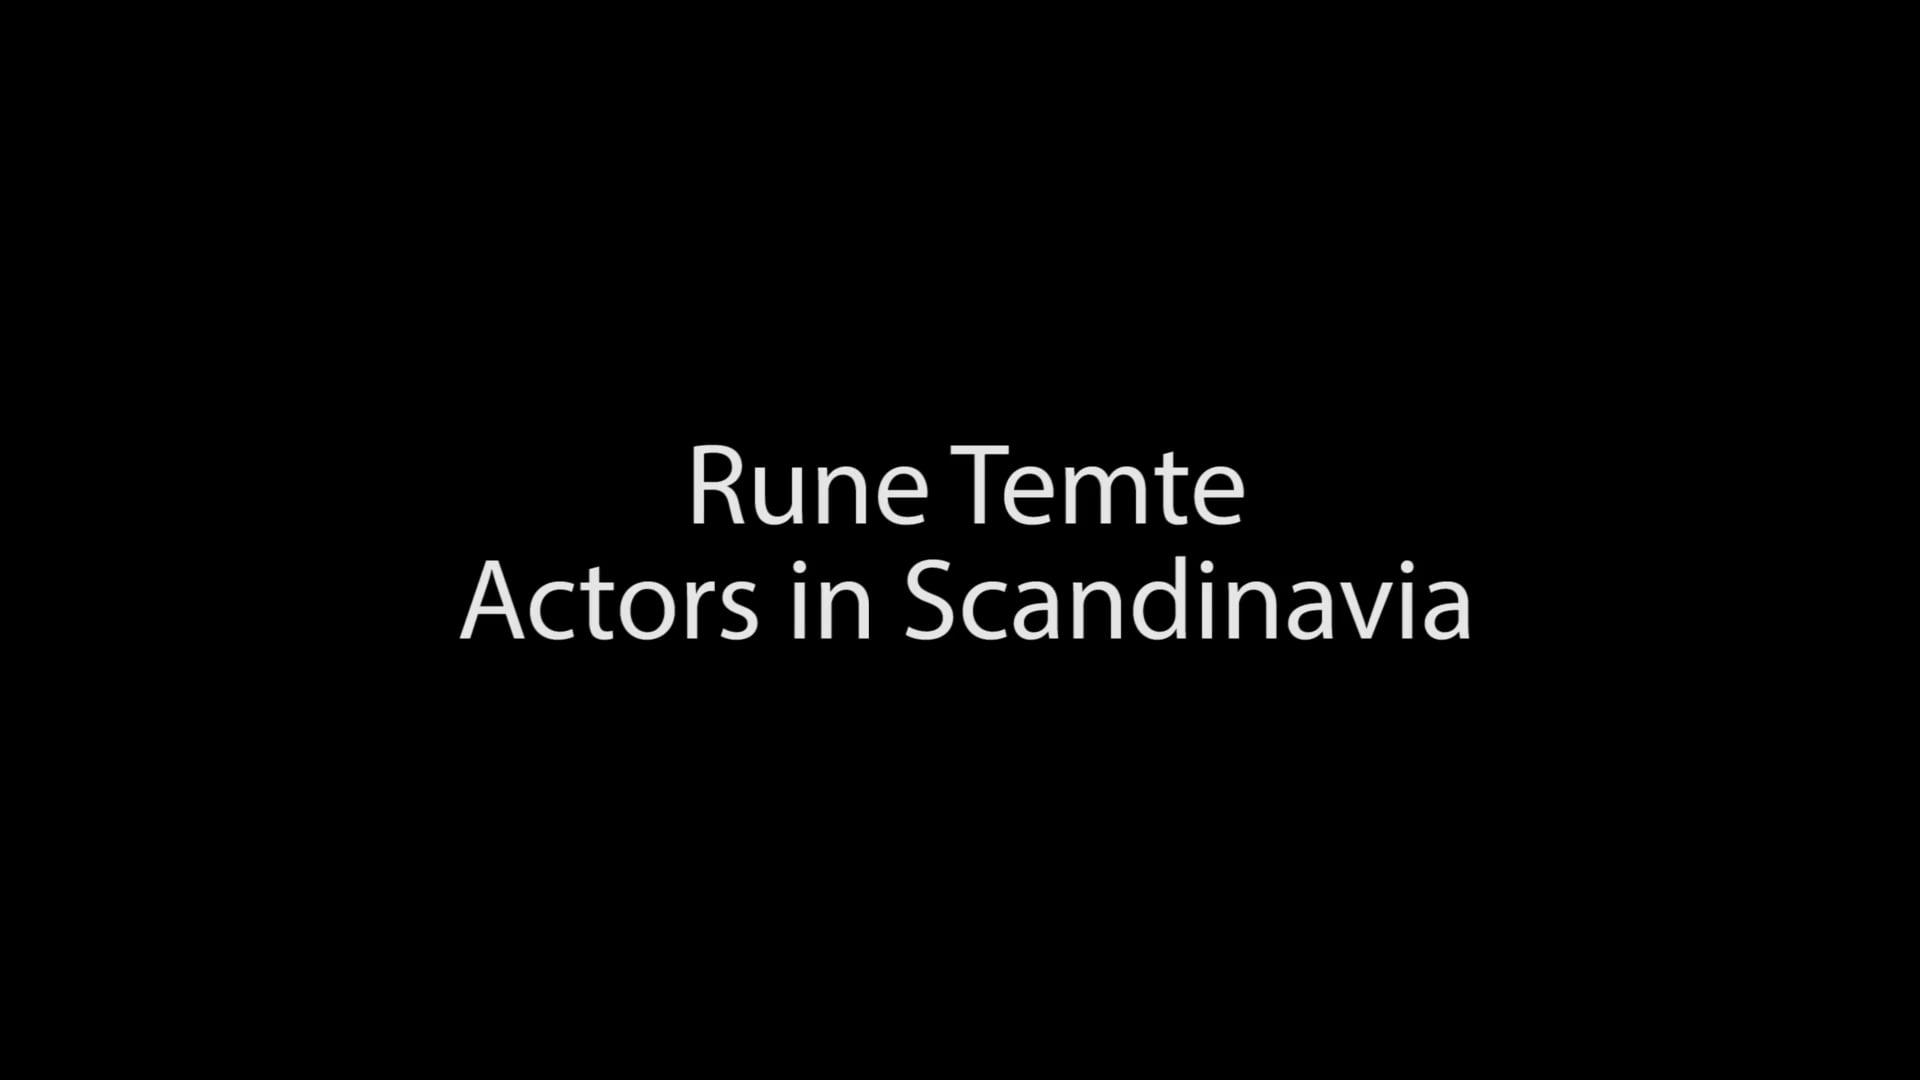 Rune Temte Showreel 2019. Duration 9 minutes.